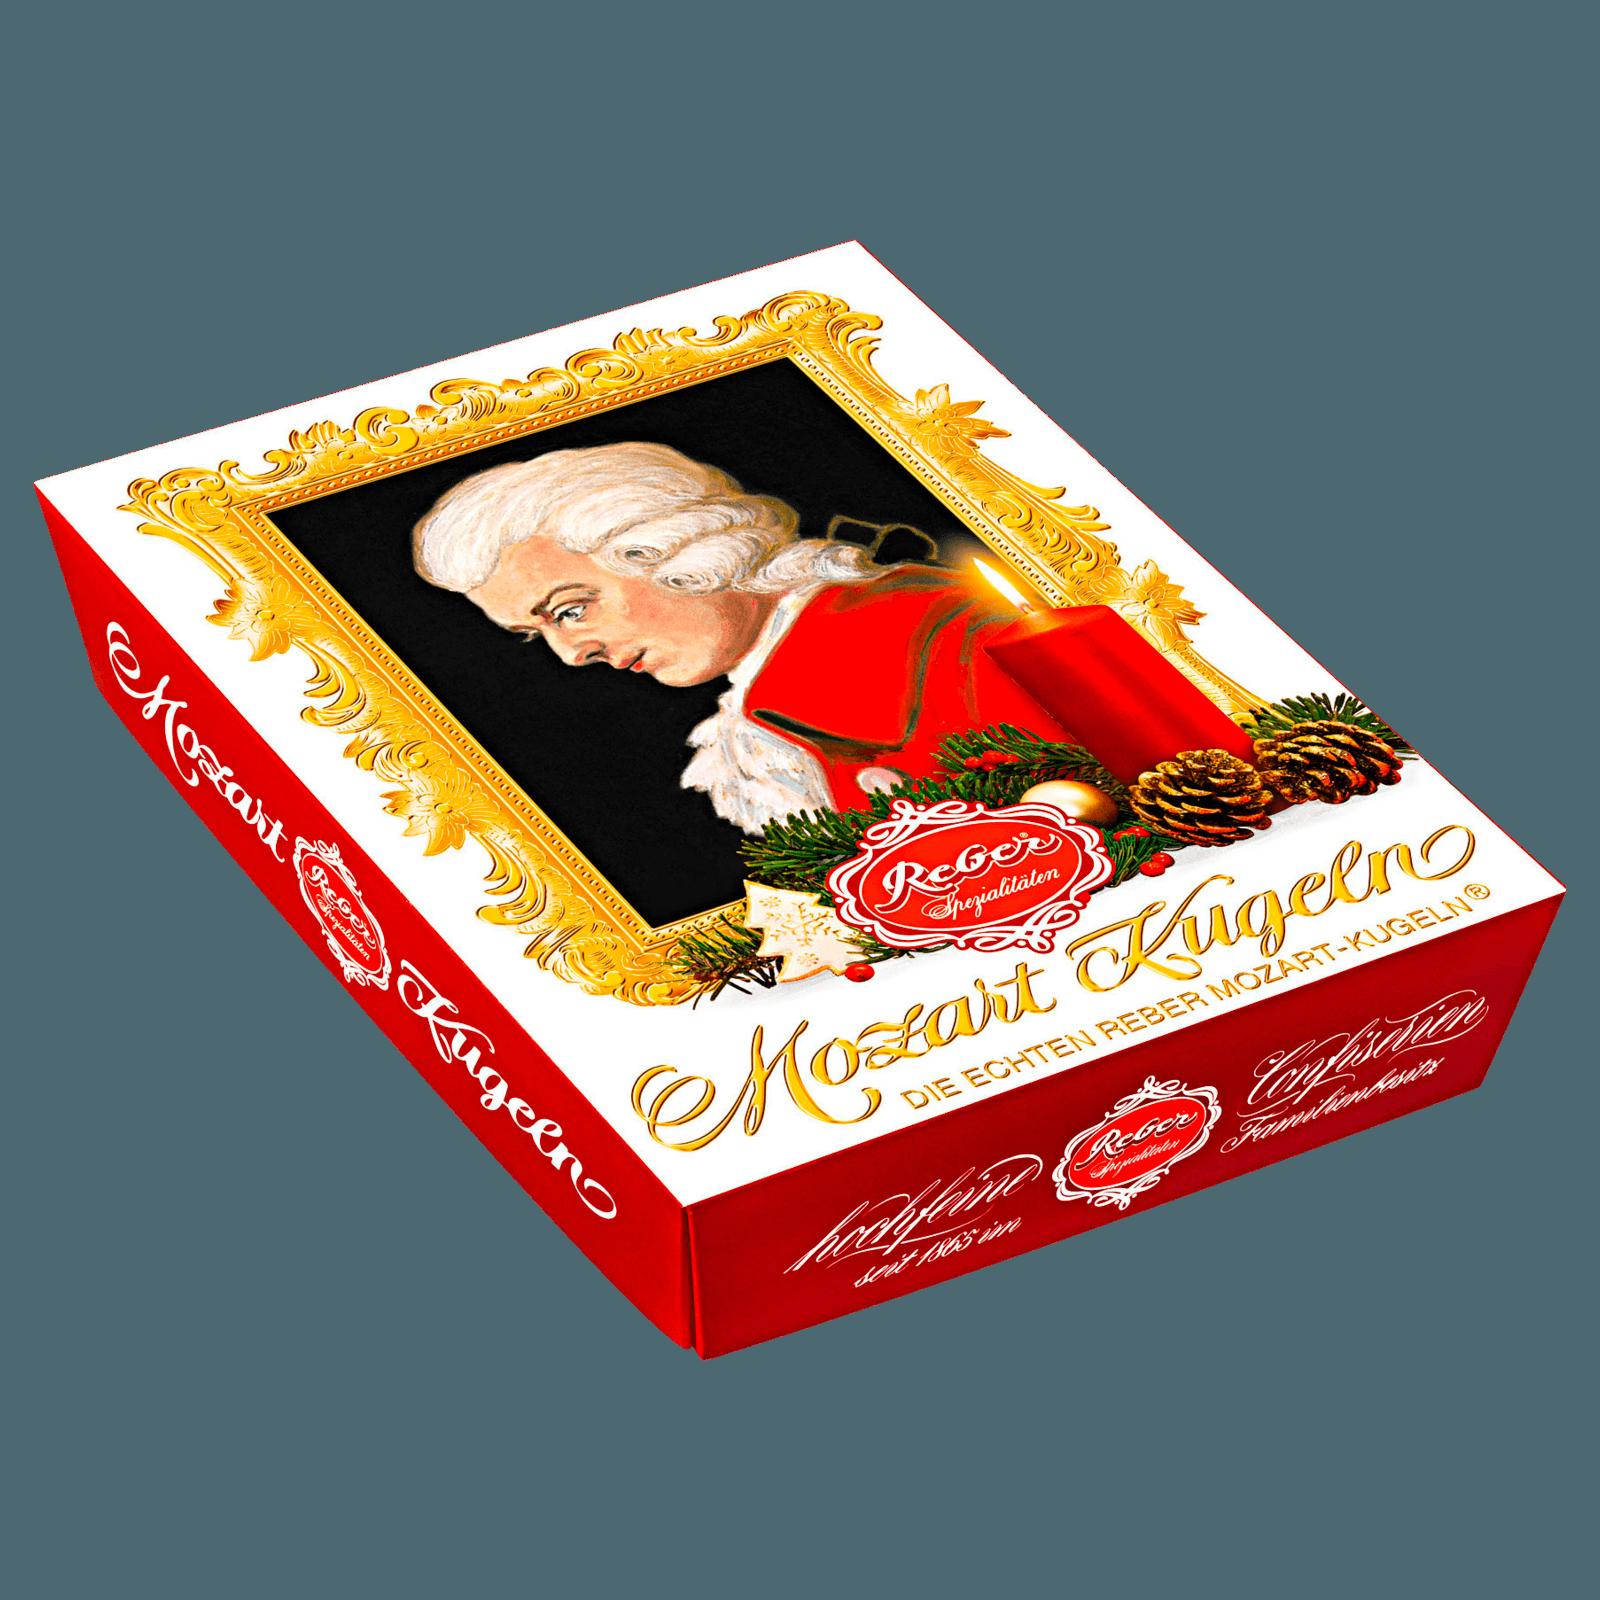 Reber Mozart-Kugeln 120g bei REWE online bestellen!